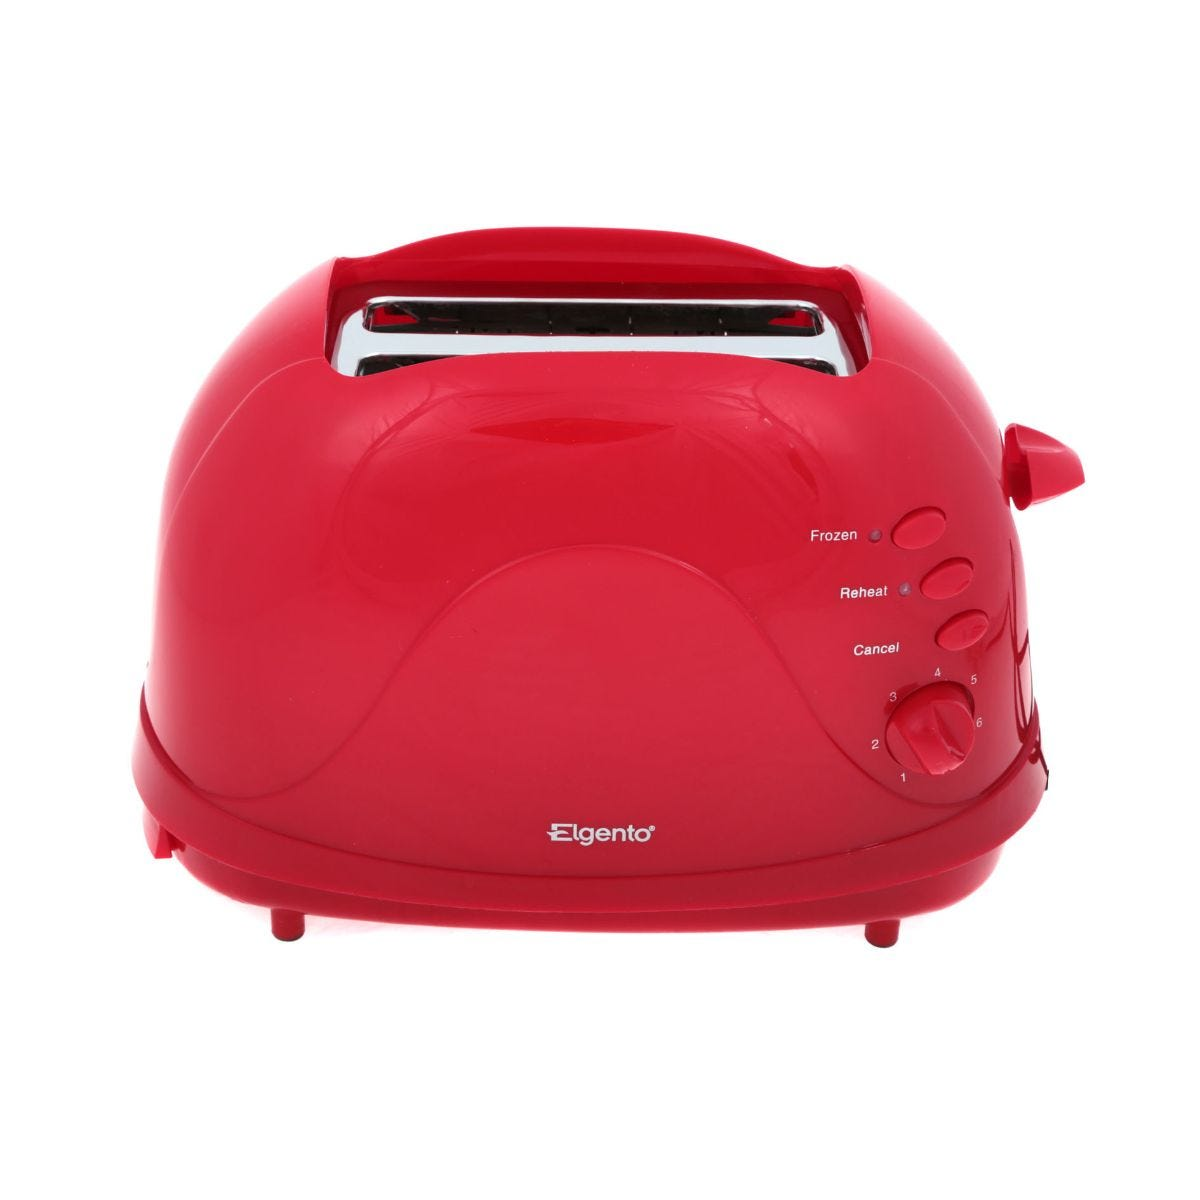 Elgento 2 Slice Toaster, Red